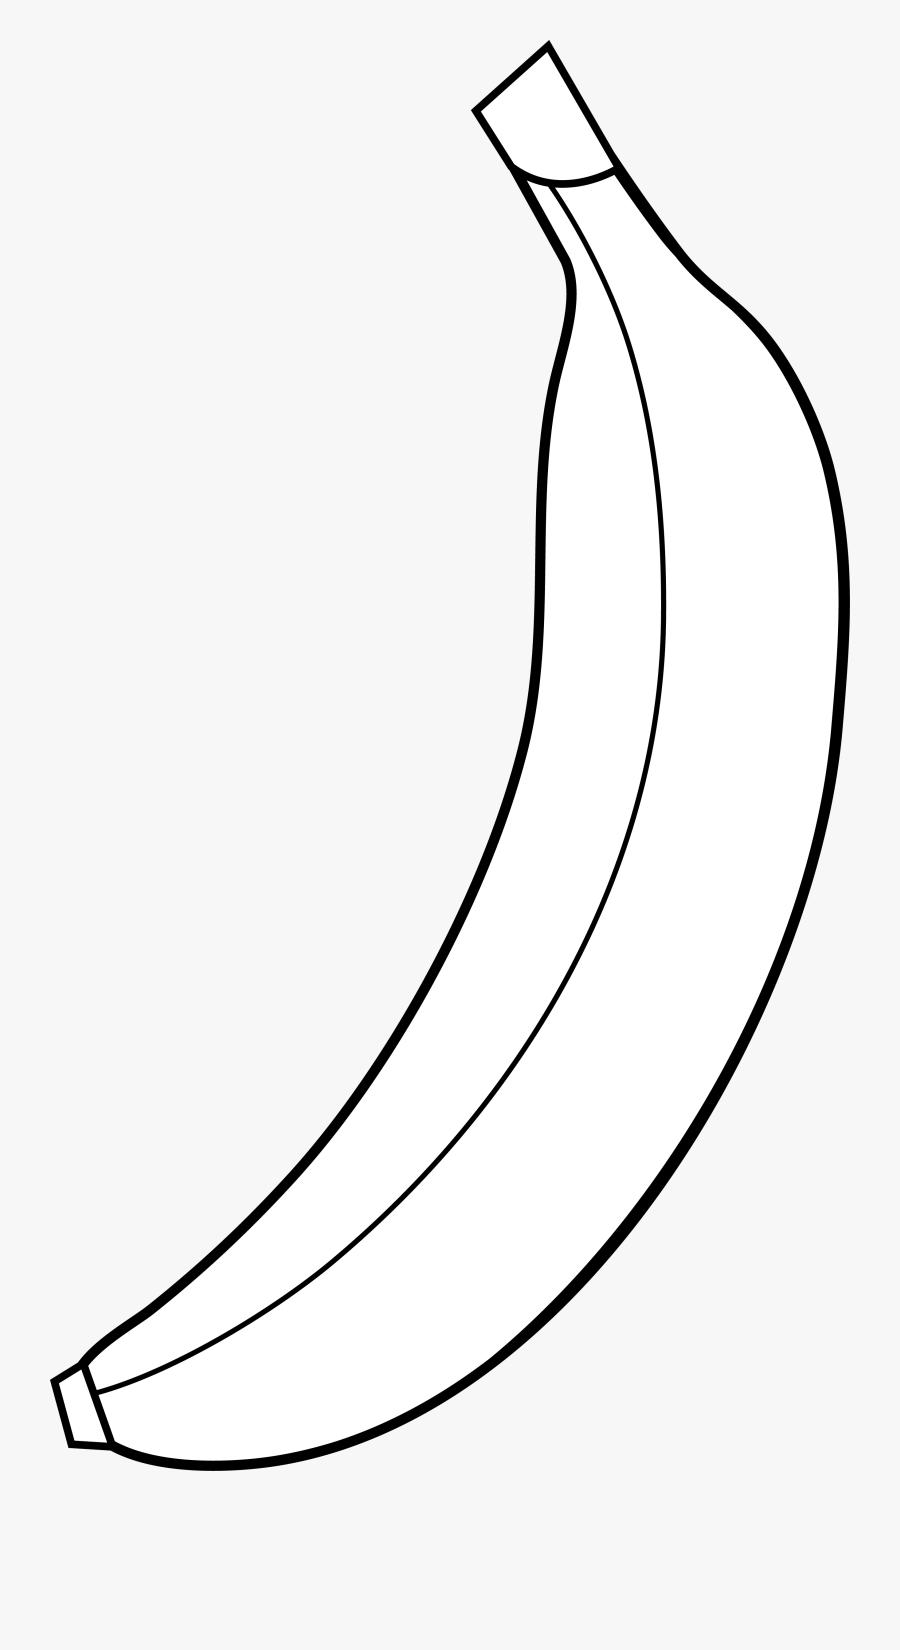 Banana Clipart 5 Image Clipartcow - Banana Logo Black And White, Transparent Clipart